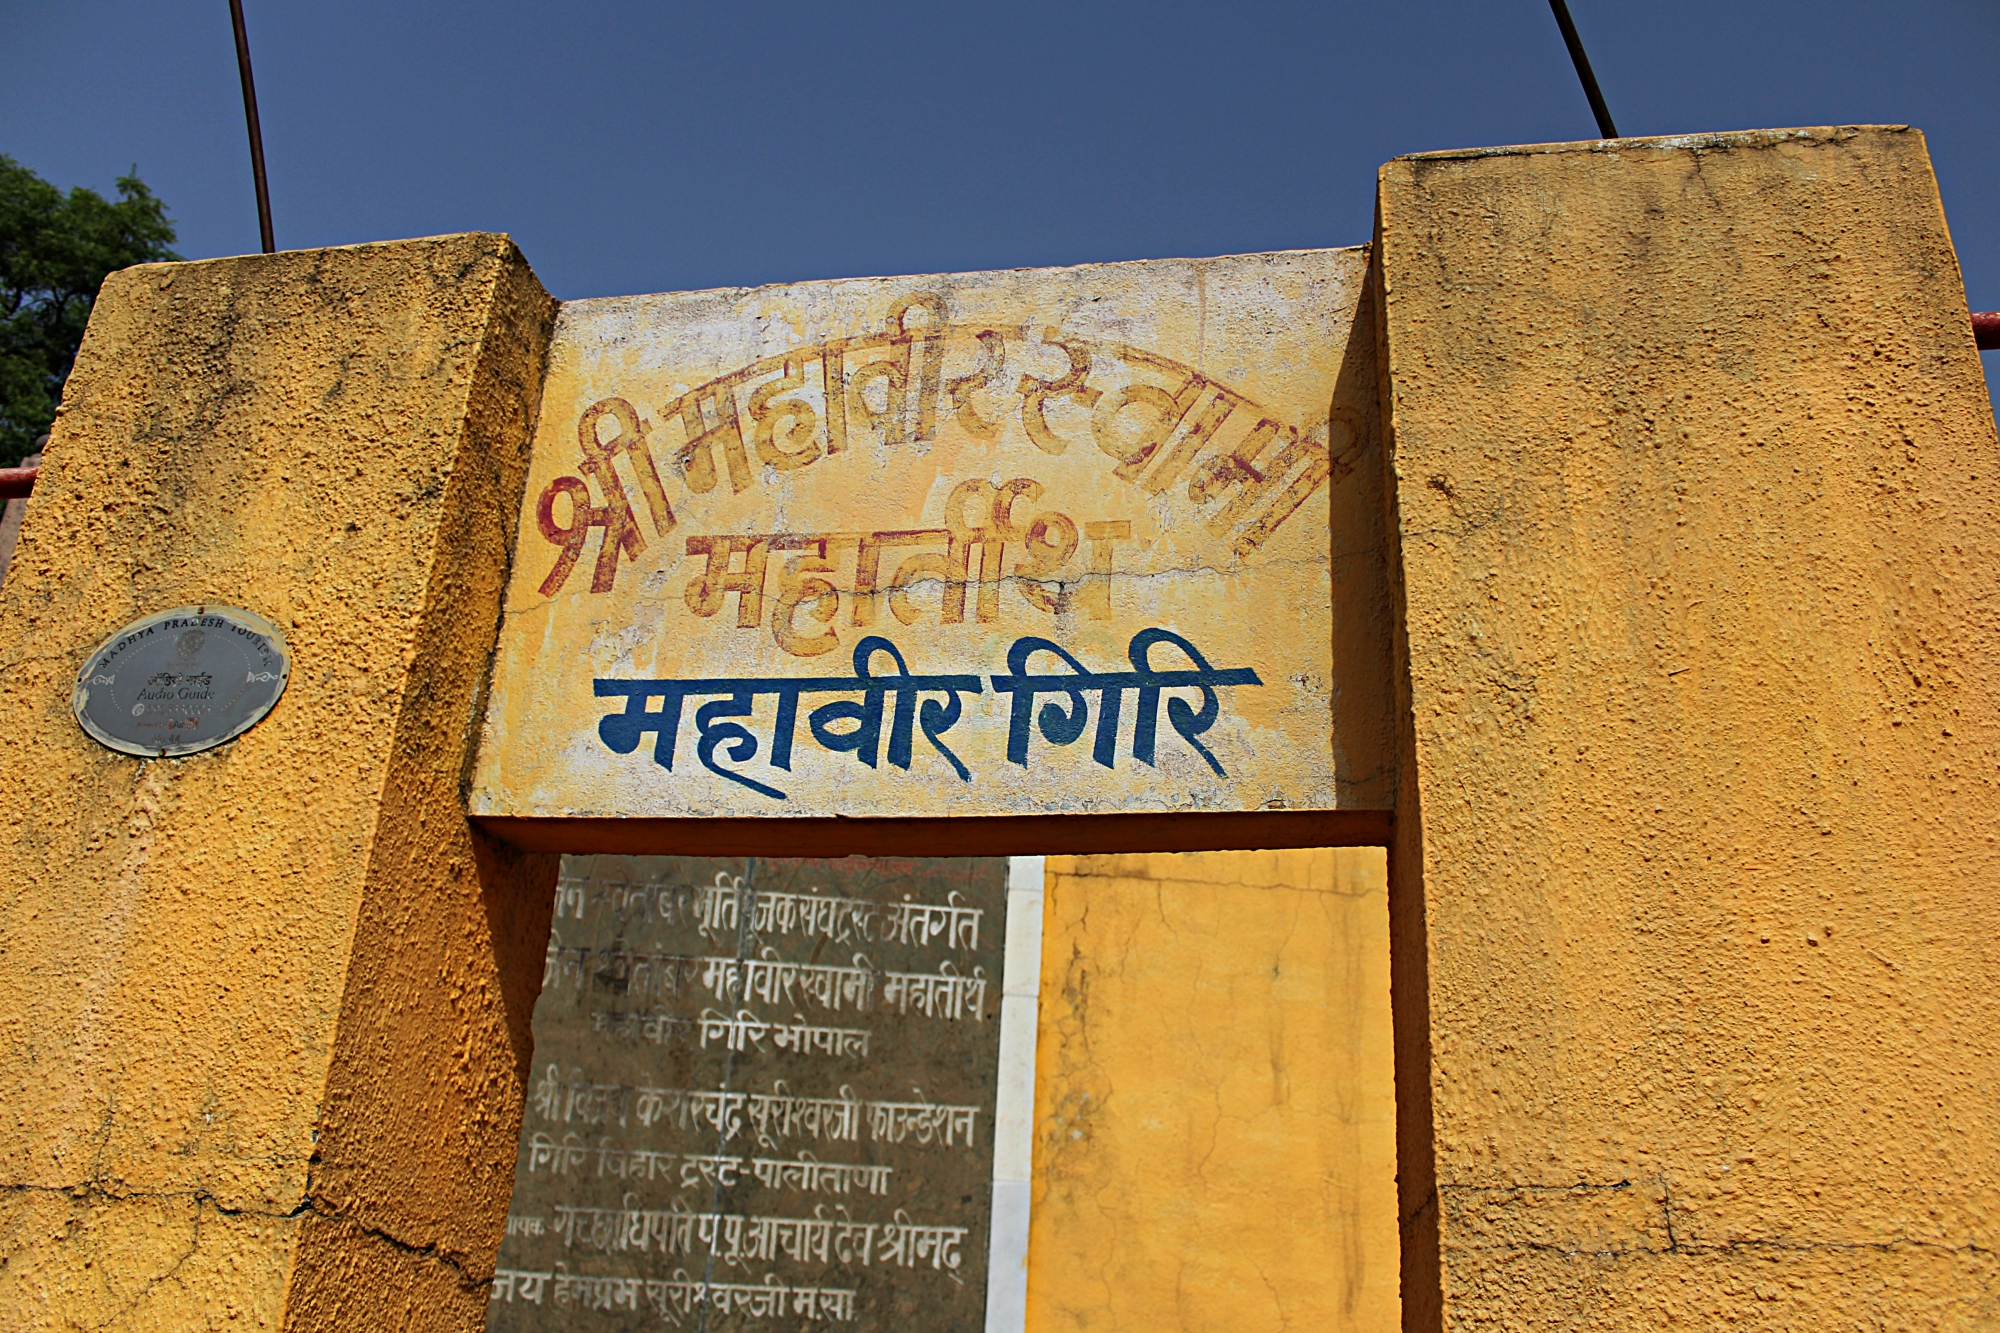 Mahaveer Giri in Bhopal